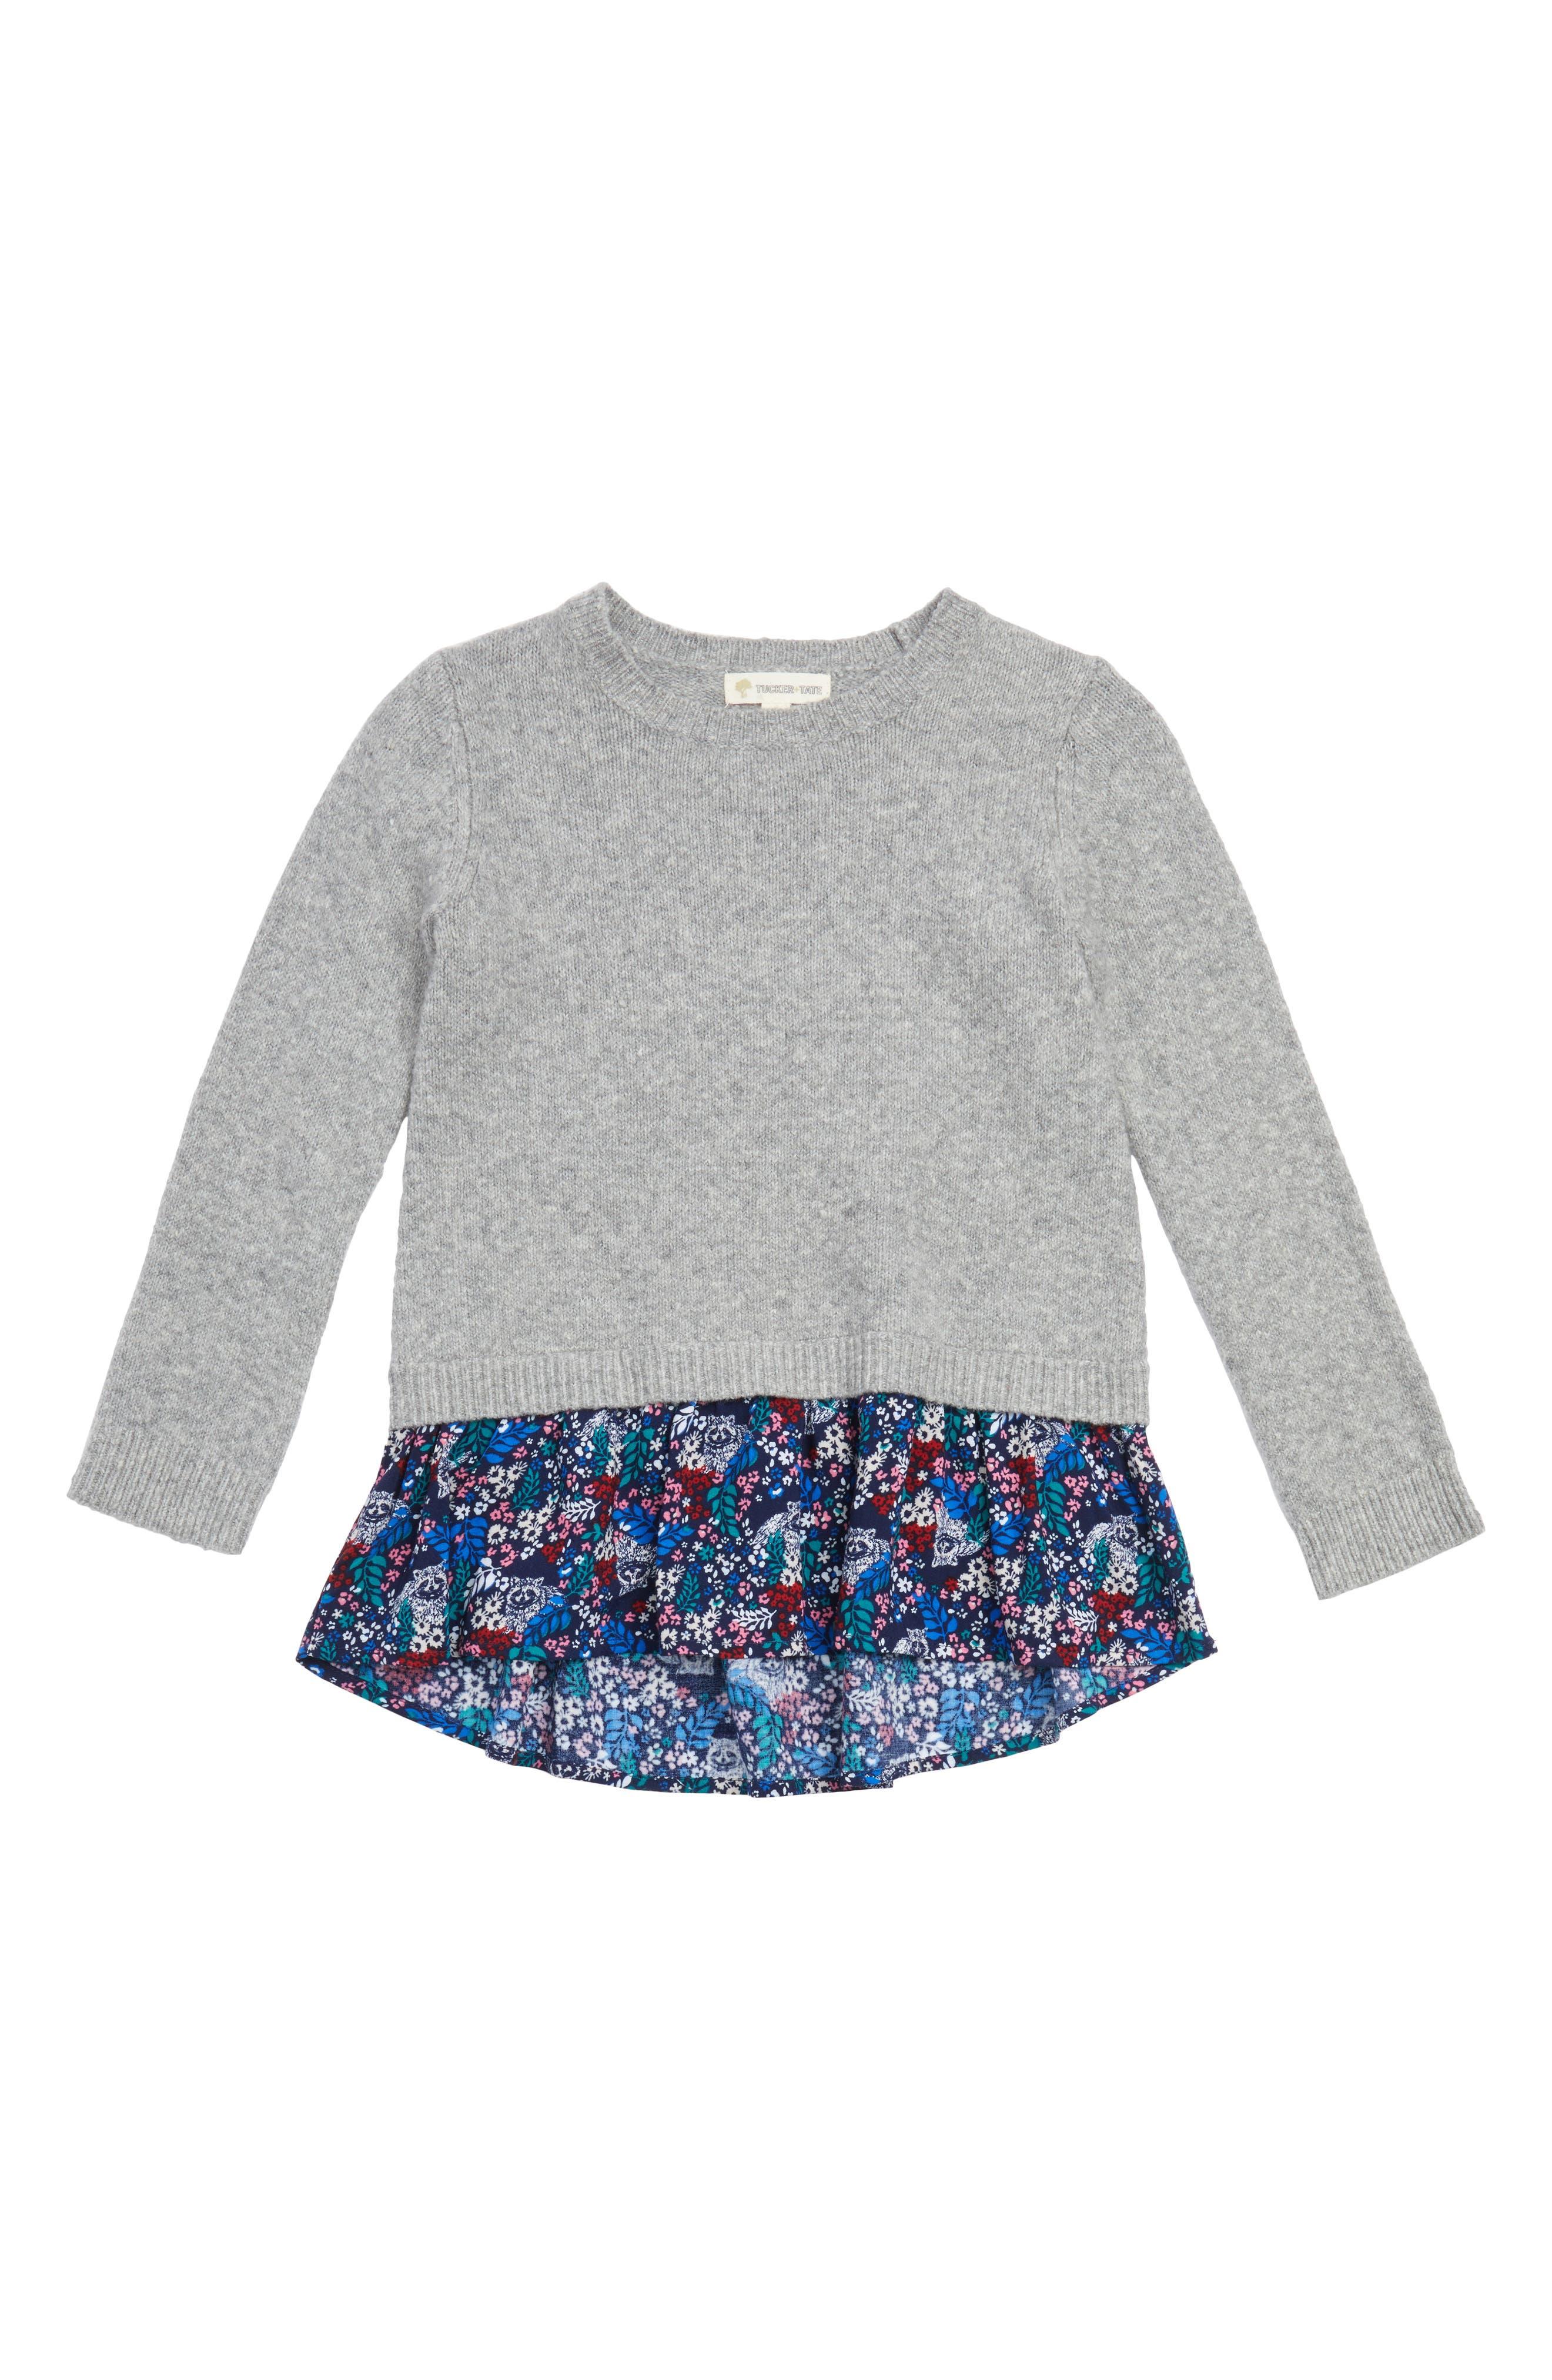 Mixed Media Sweater,                         Main,                         color, 030